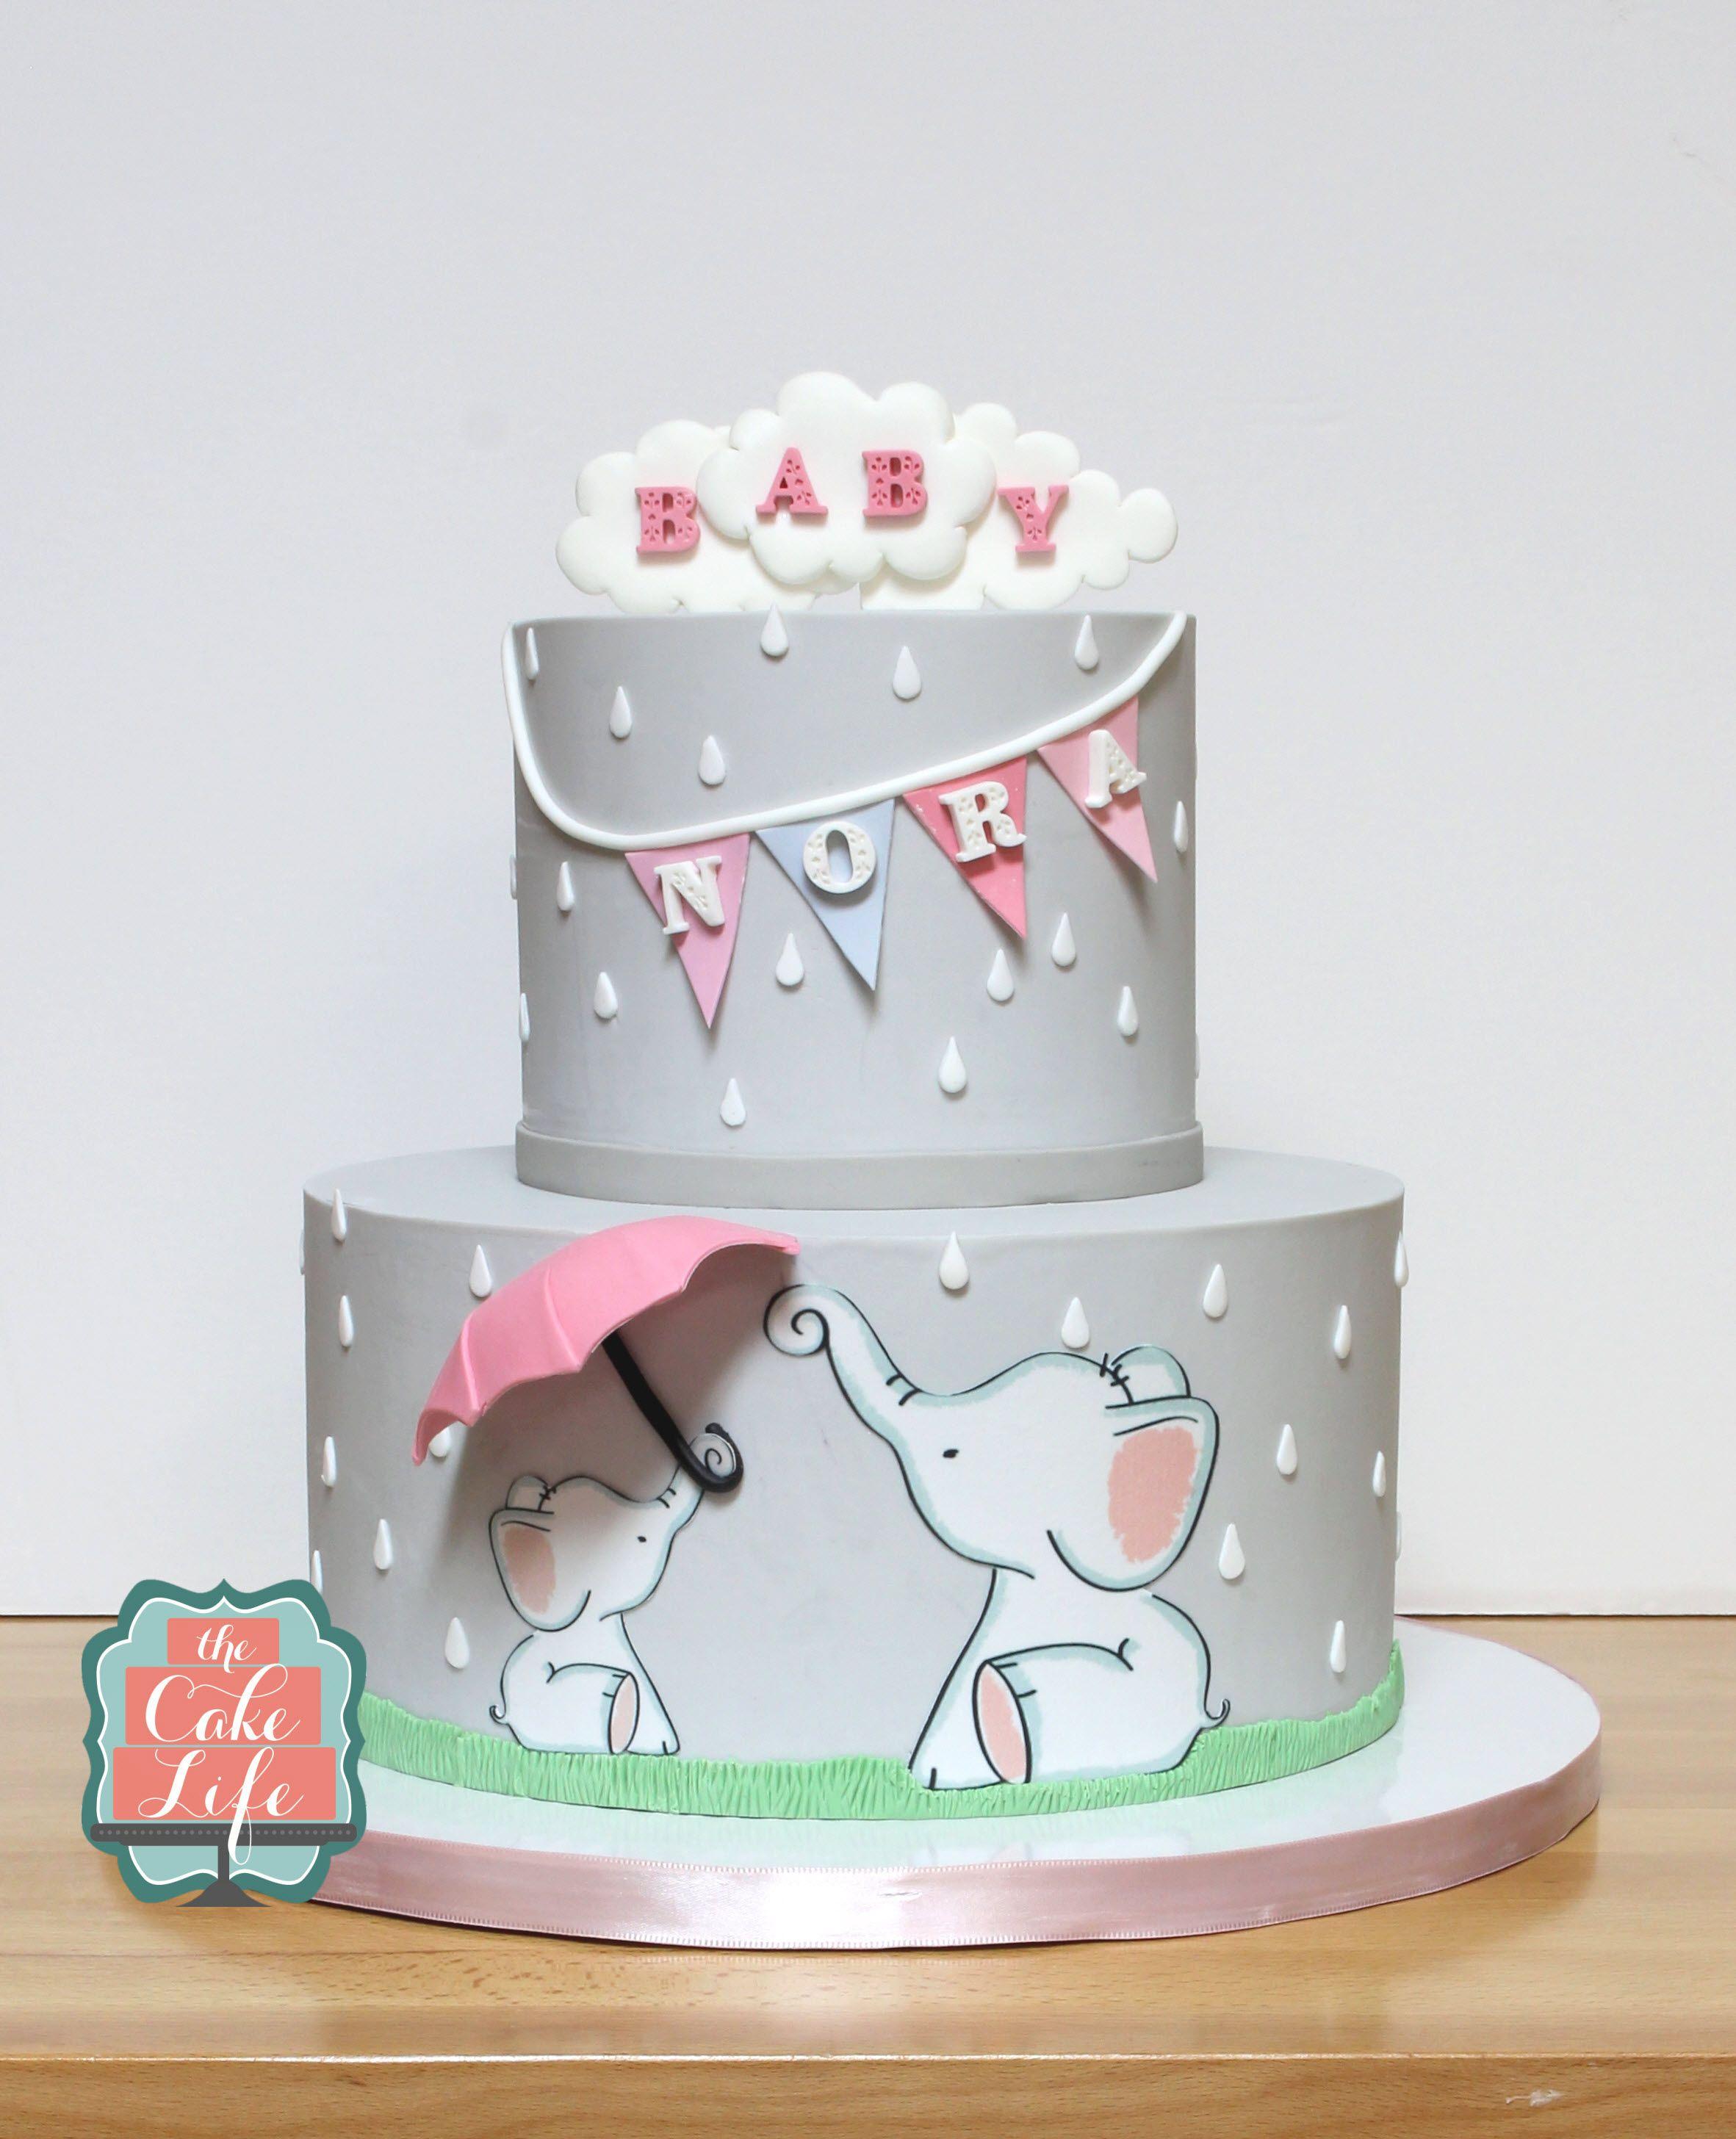 The Cake Life Cakes Dickinson ND Wedding Bismarck